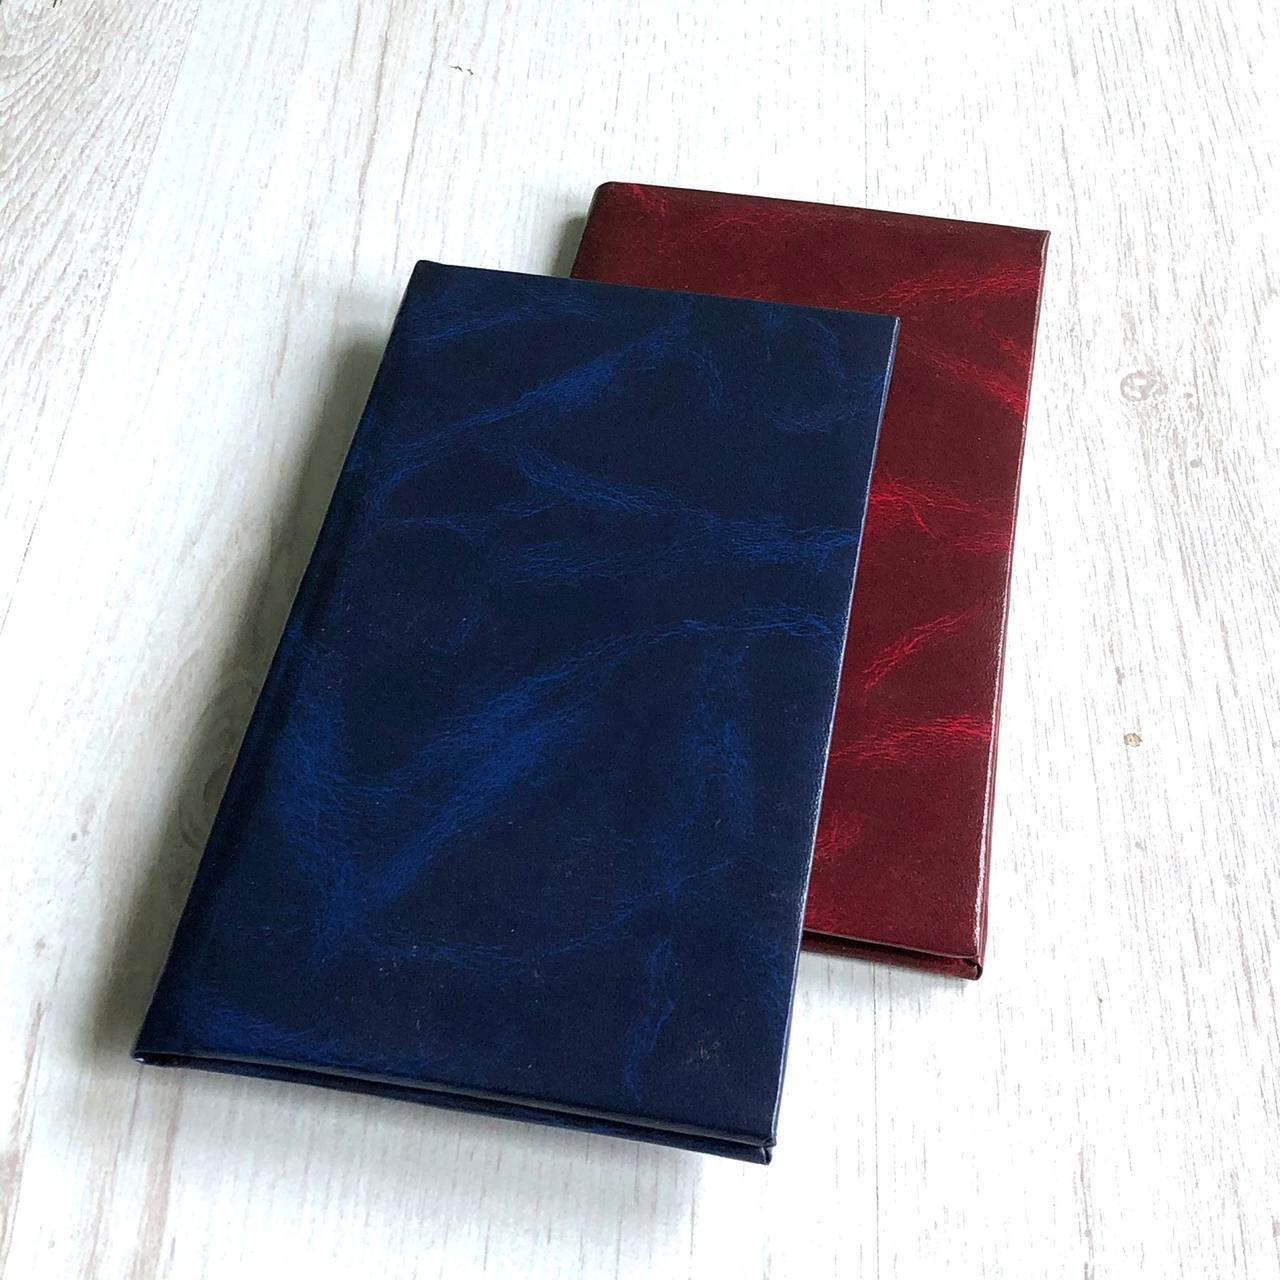 Папка-счёт А6 Скат Синяя 11.5х21 см. ПП-7